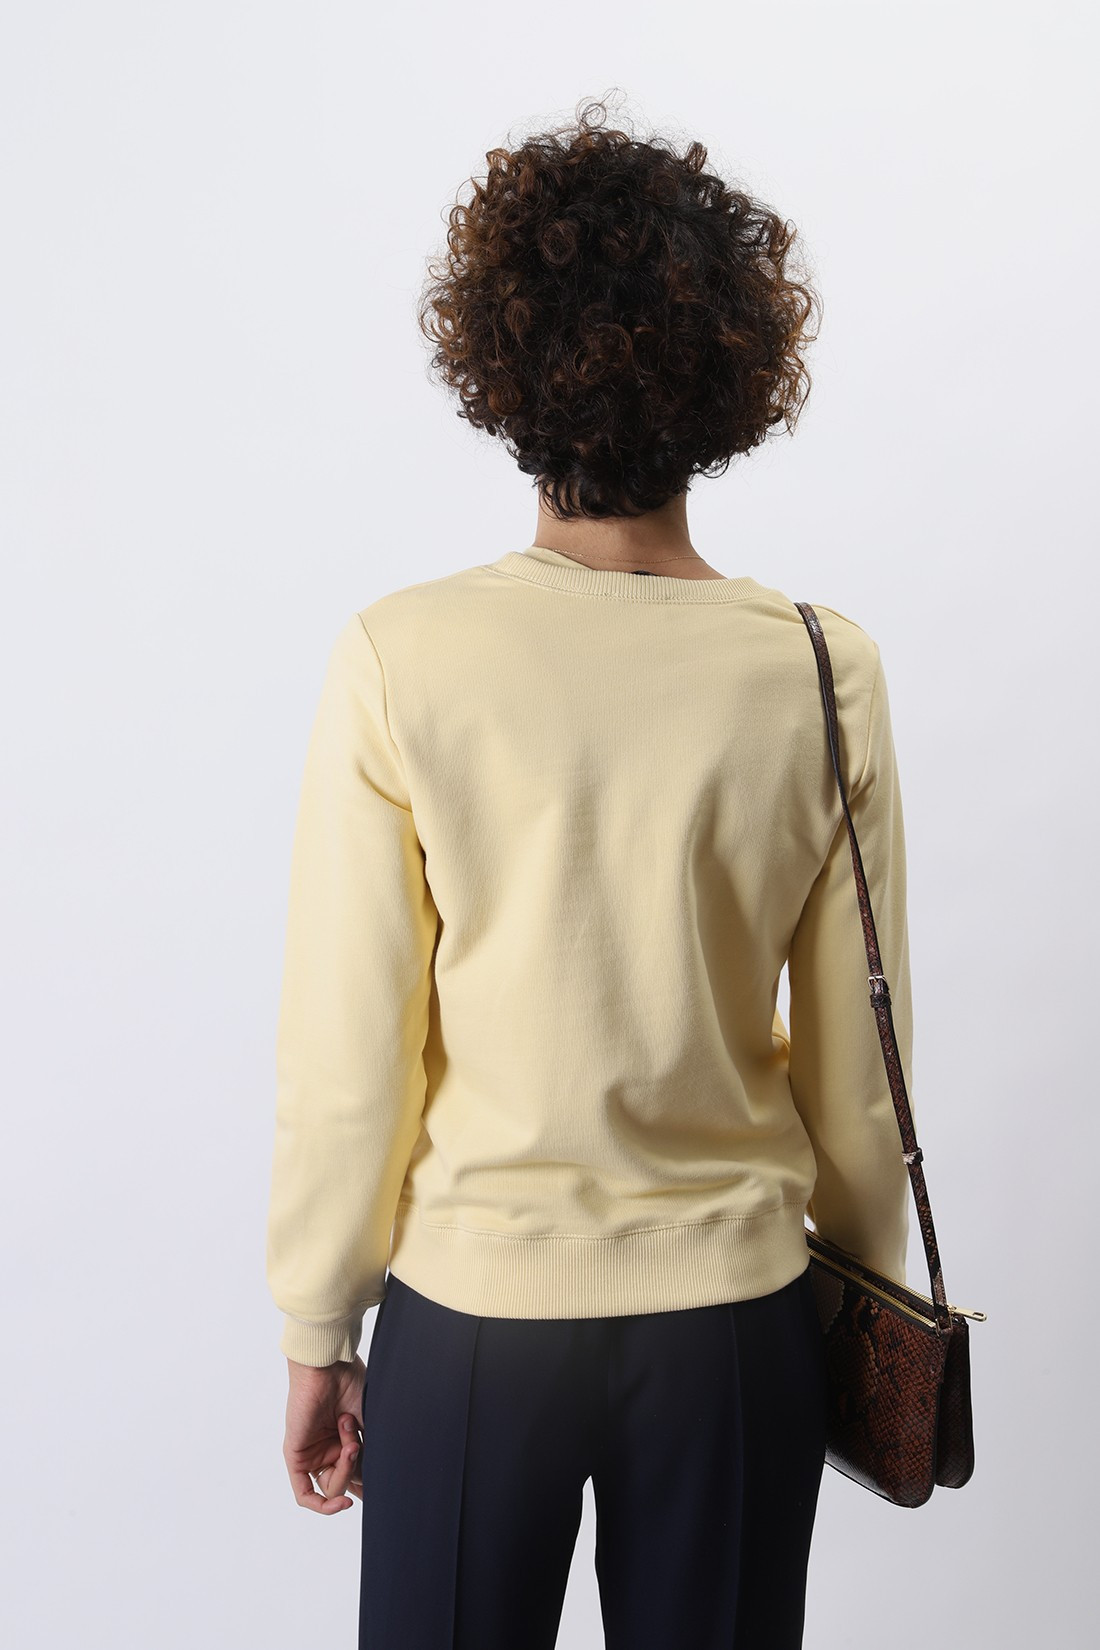 A.P.C. FOR WOMAN / Sweat item Jaune